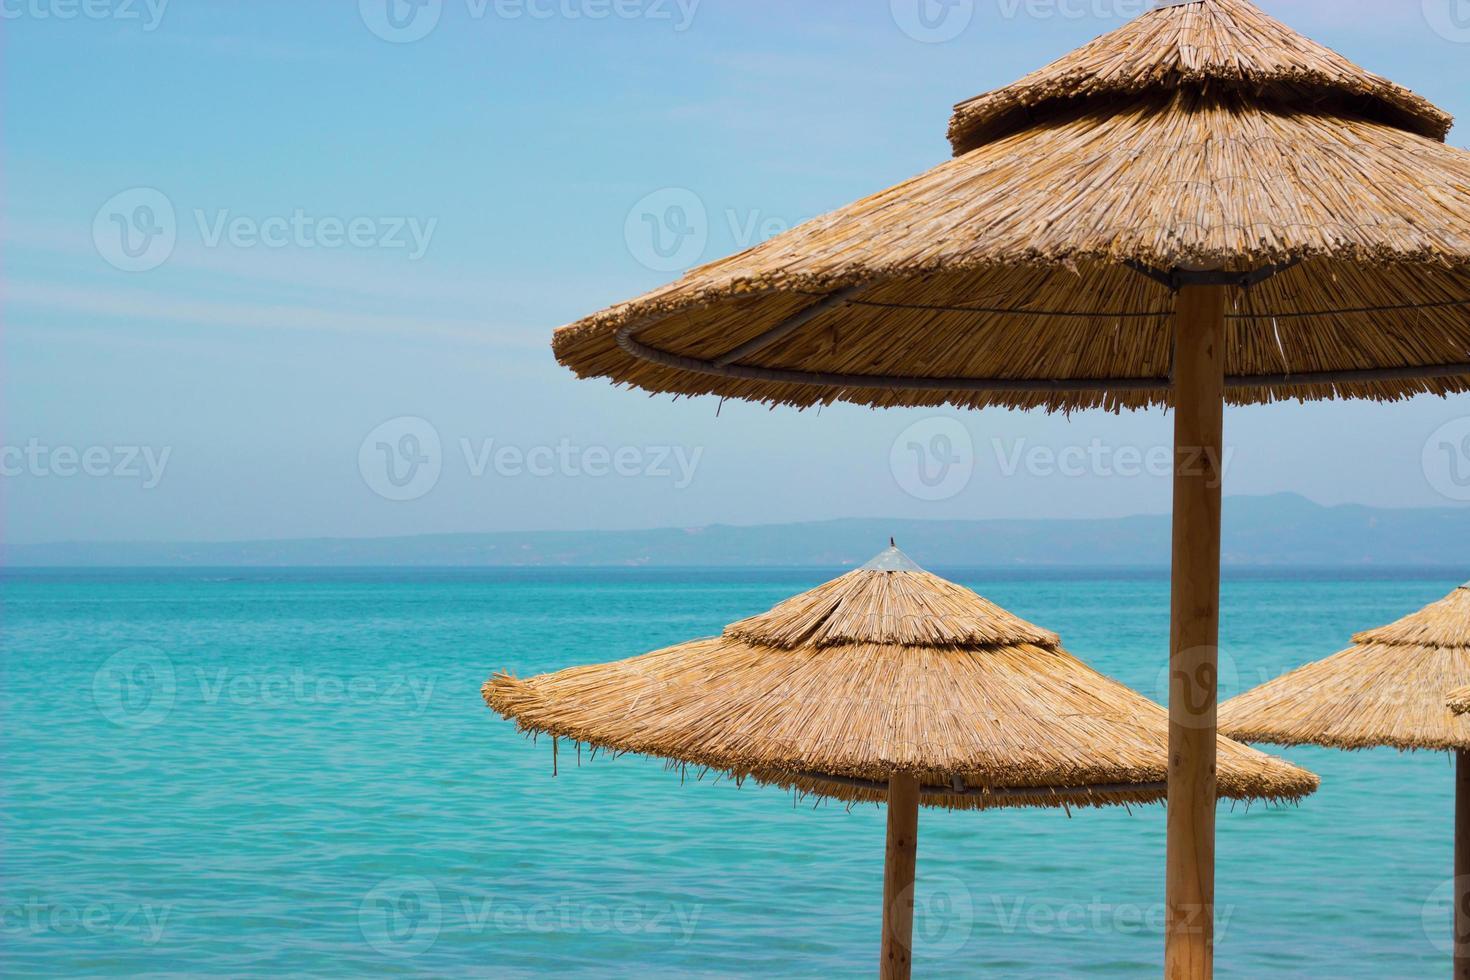 Straw sunshades on the beach photo